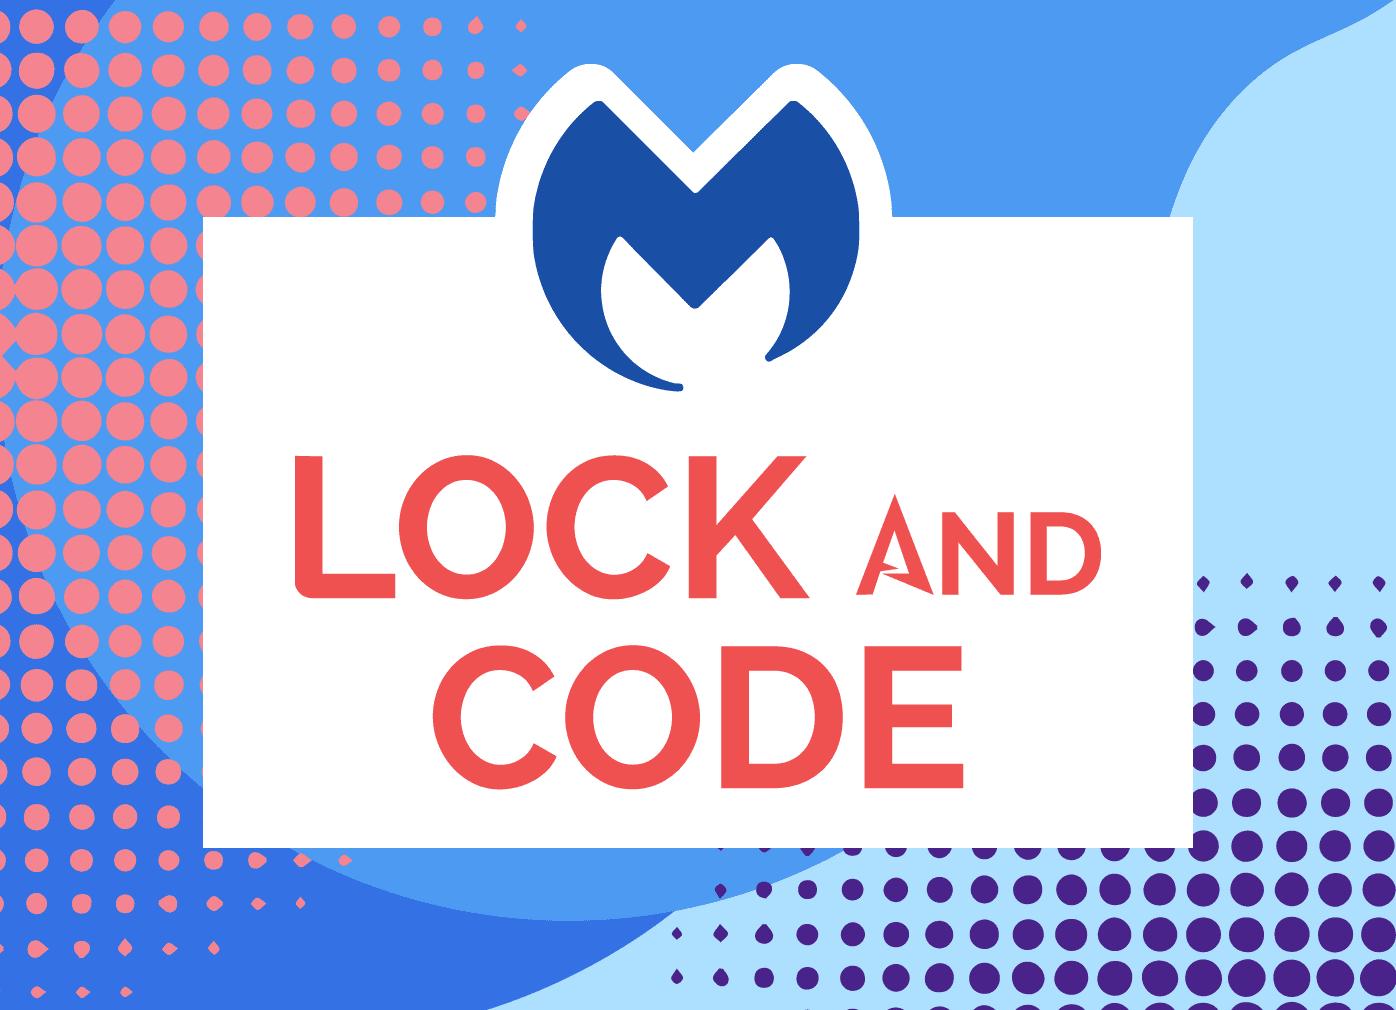 The Malwarebytes 2021 State of Malware report: Lock and Code S02E04